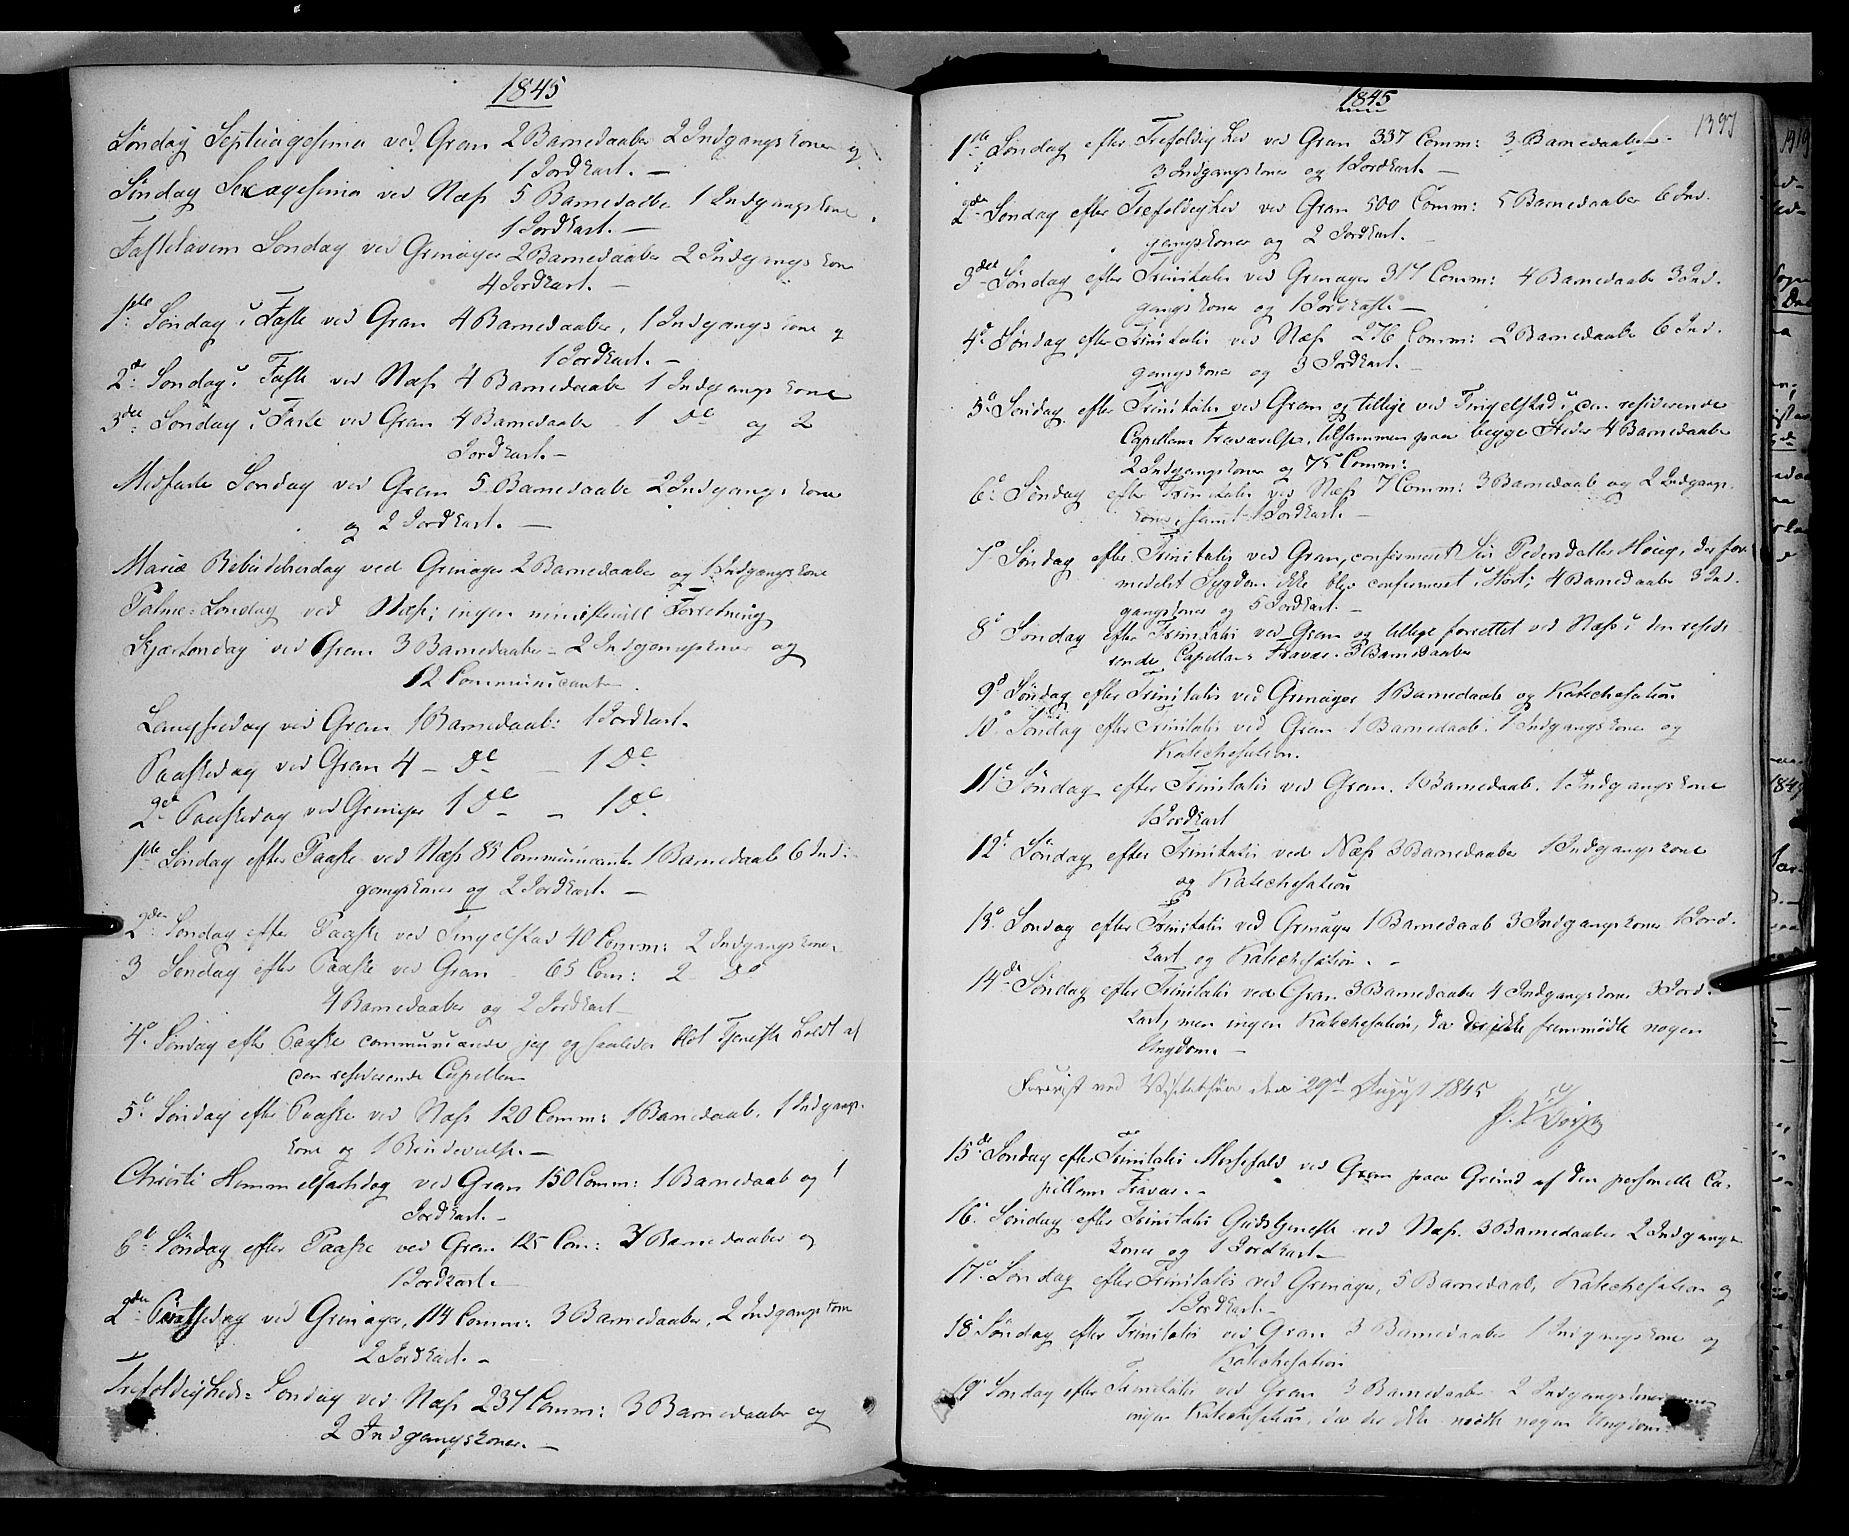 SAH, Gran prestekontor, Ministerialbok nr. 11, 1842-1856, s. 1396-1397